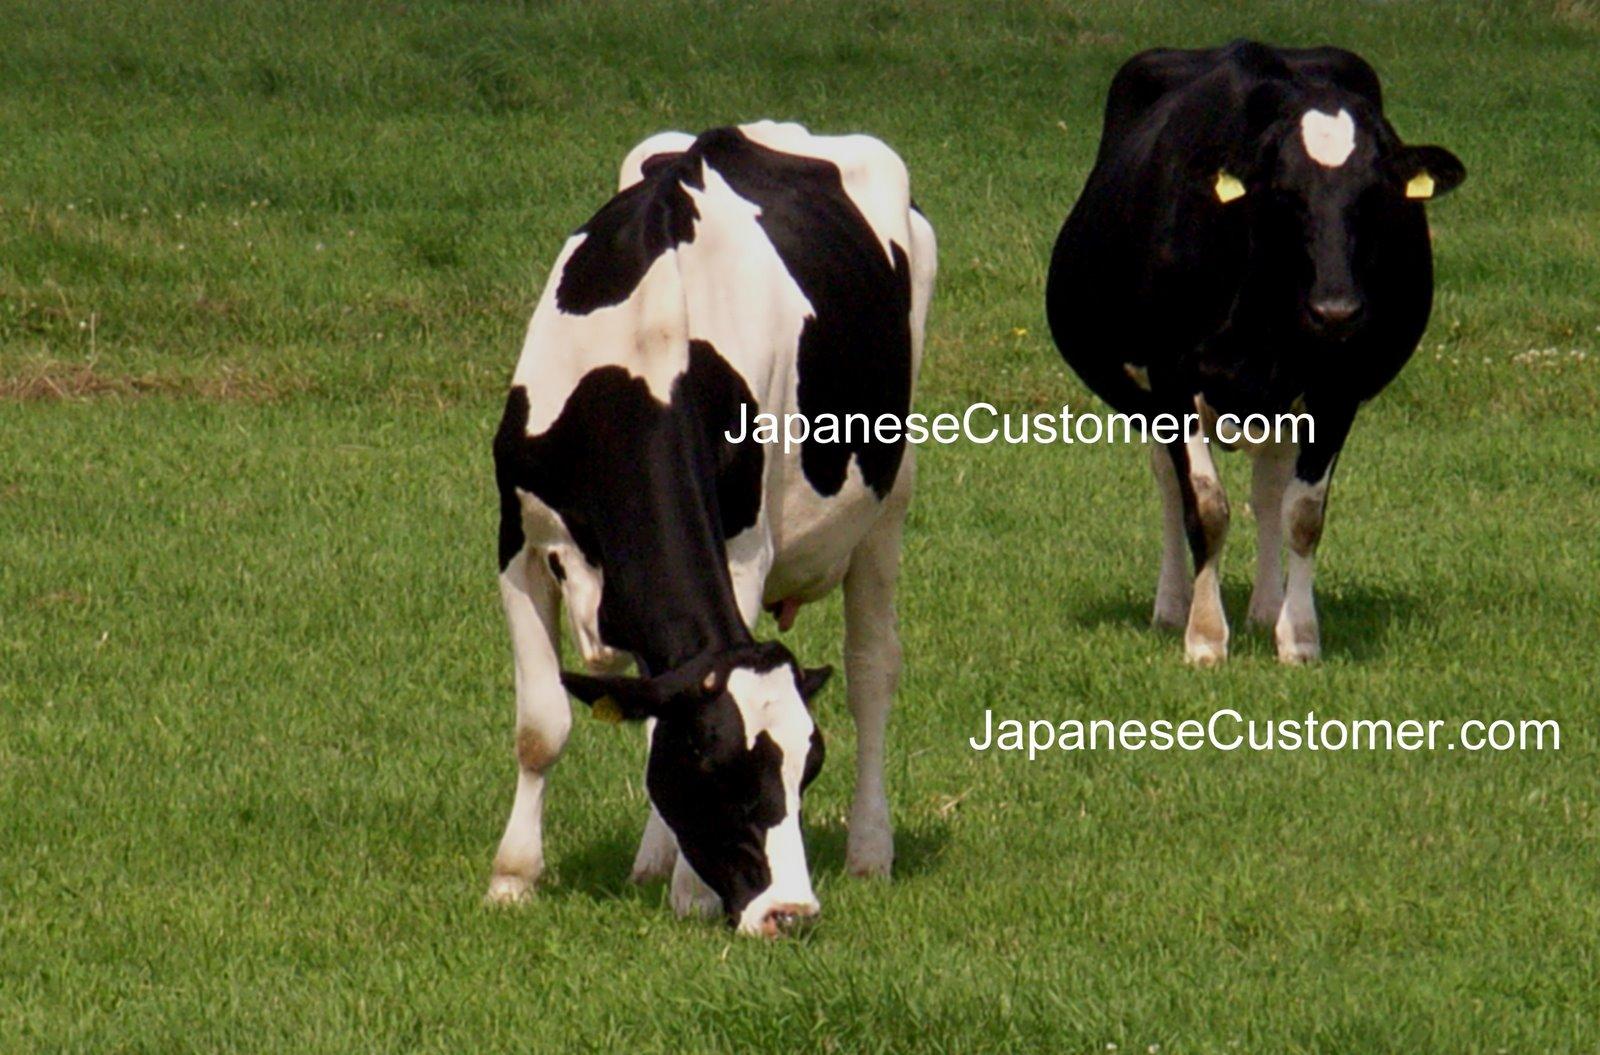 Cows grazing in Hokkaido, Japan Copyright Peter Hanami 2014